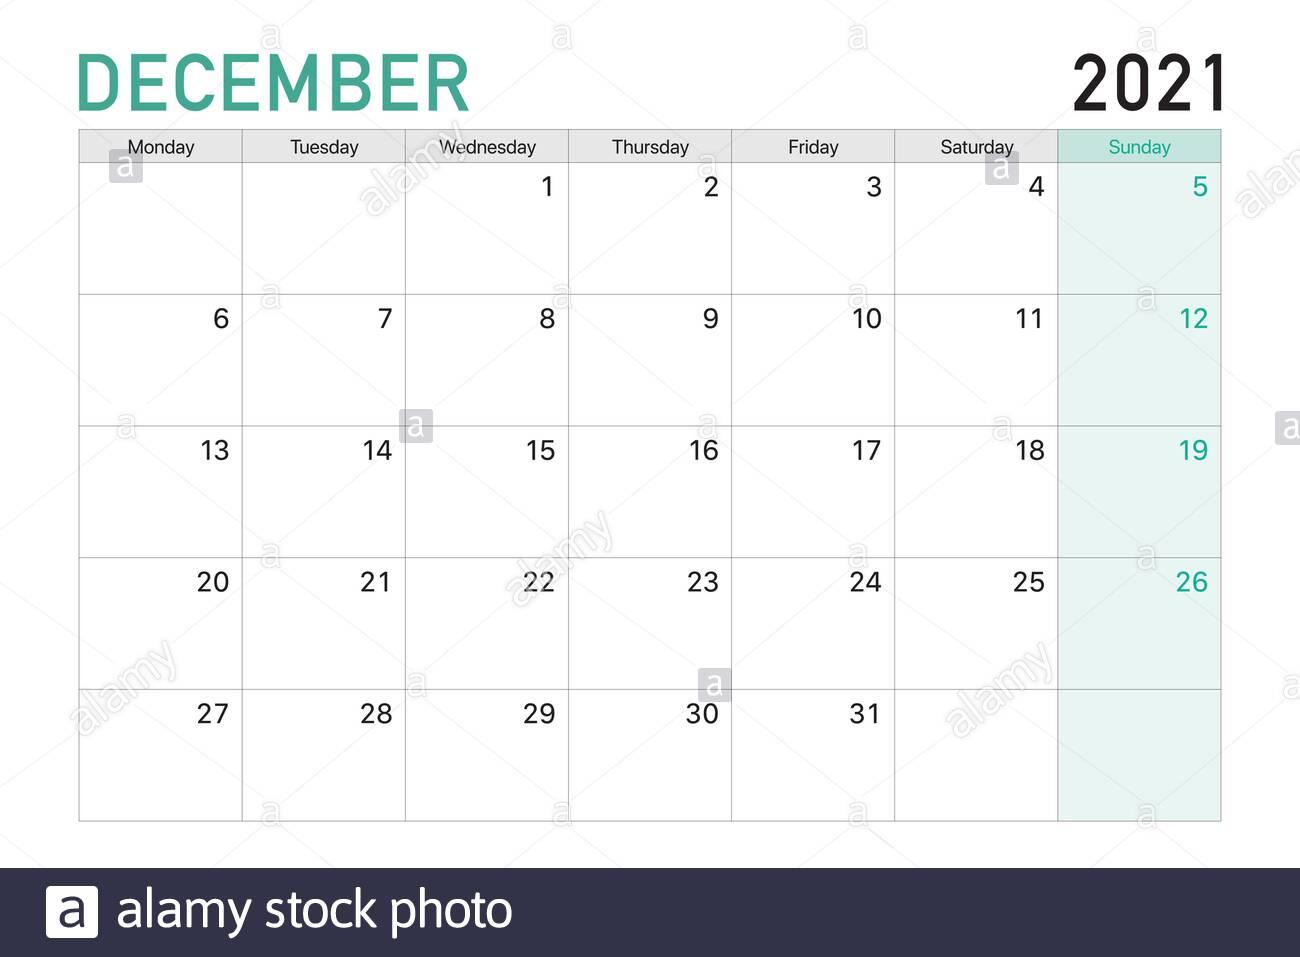 2021 December Illustration Vector Desk Calendar Weeks Start